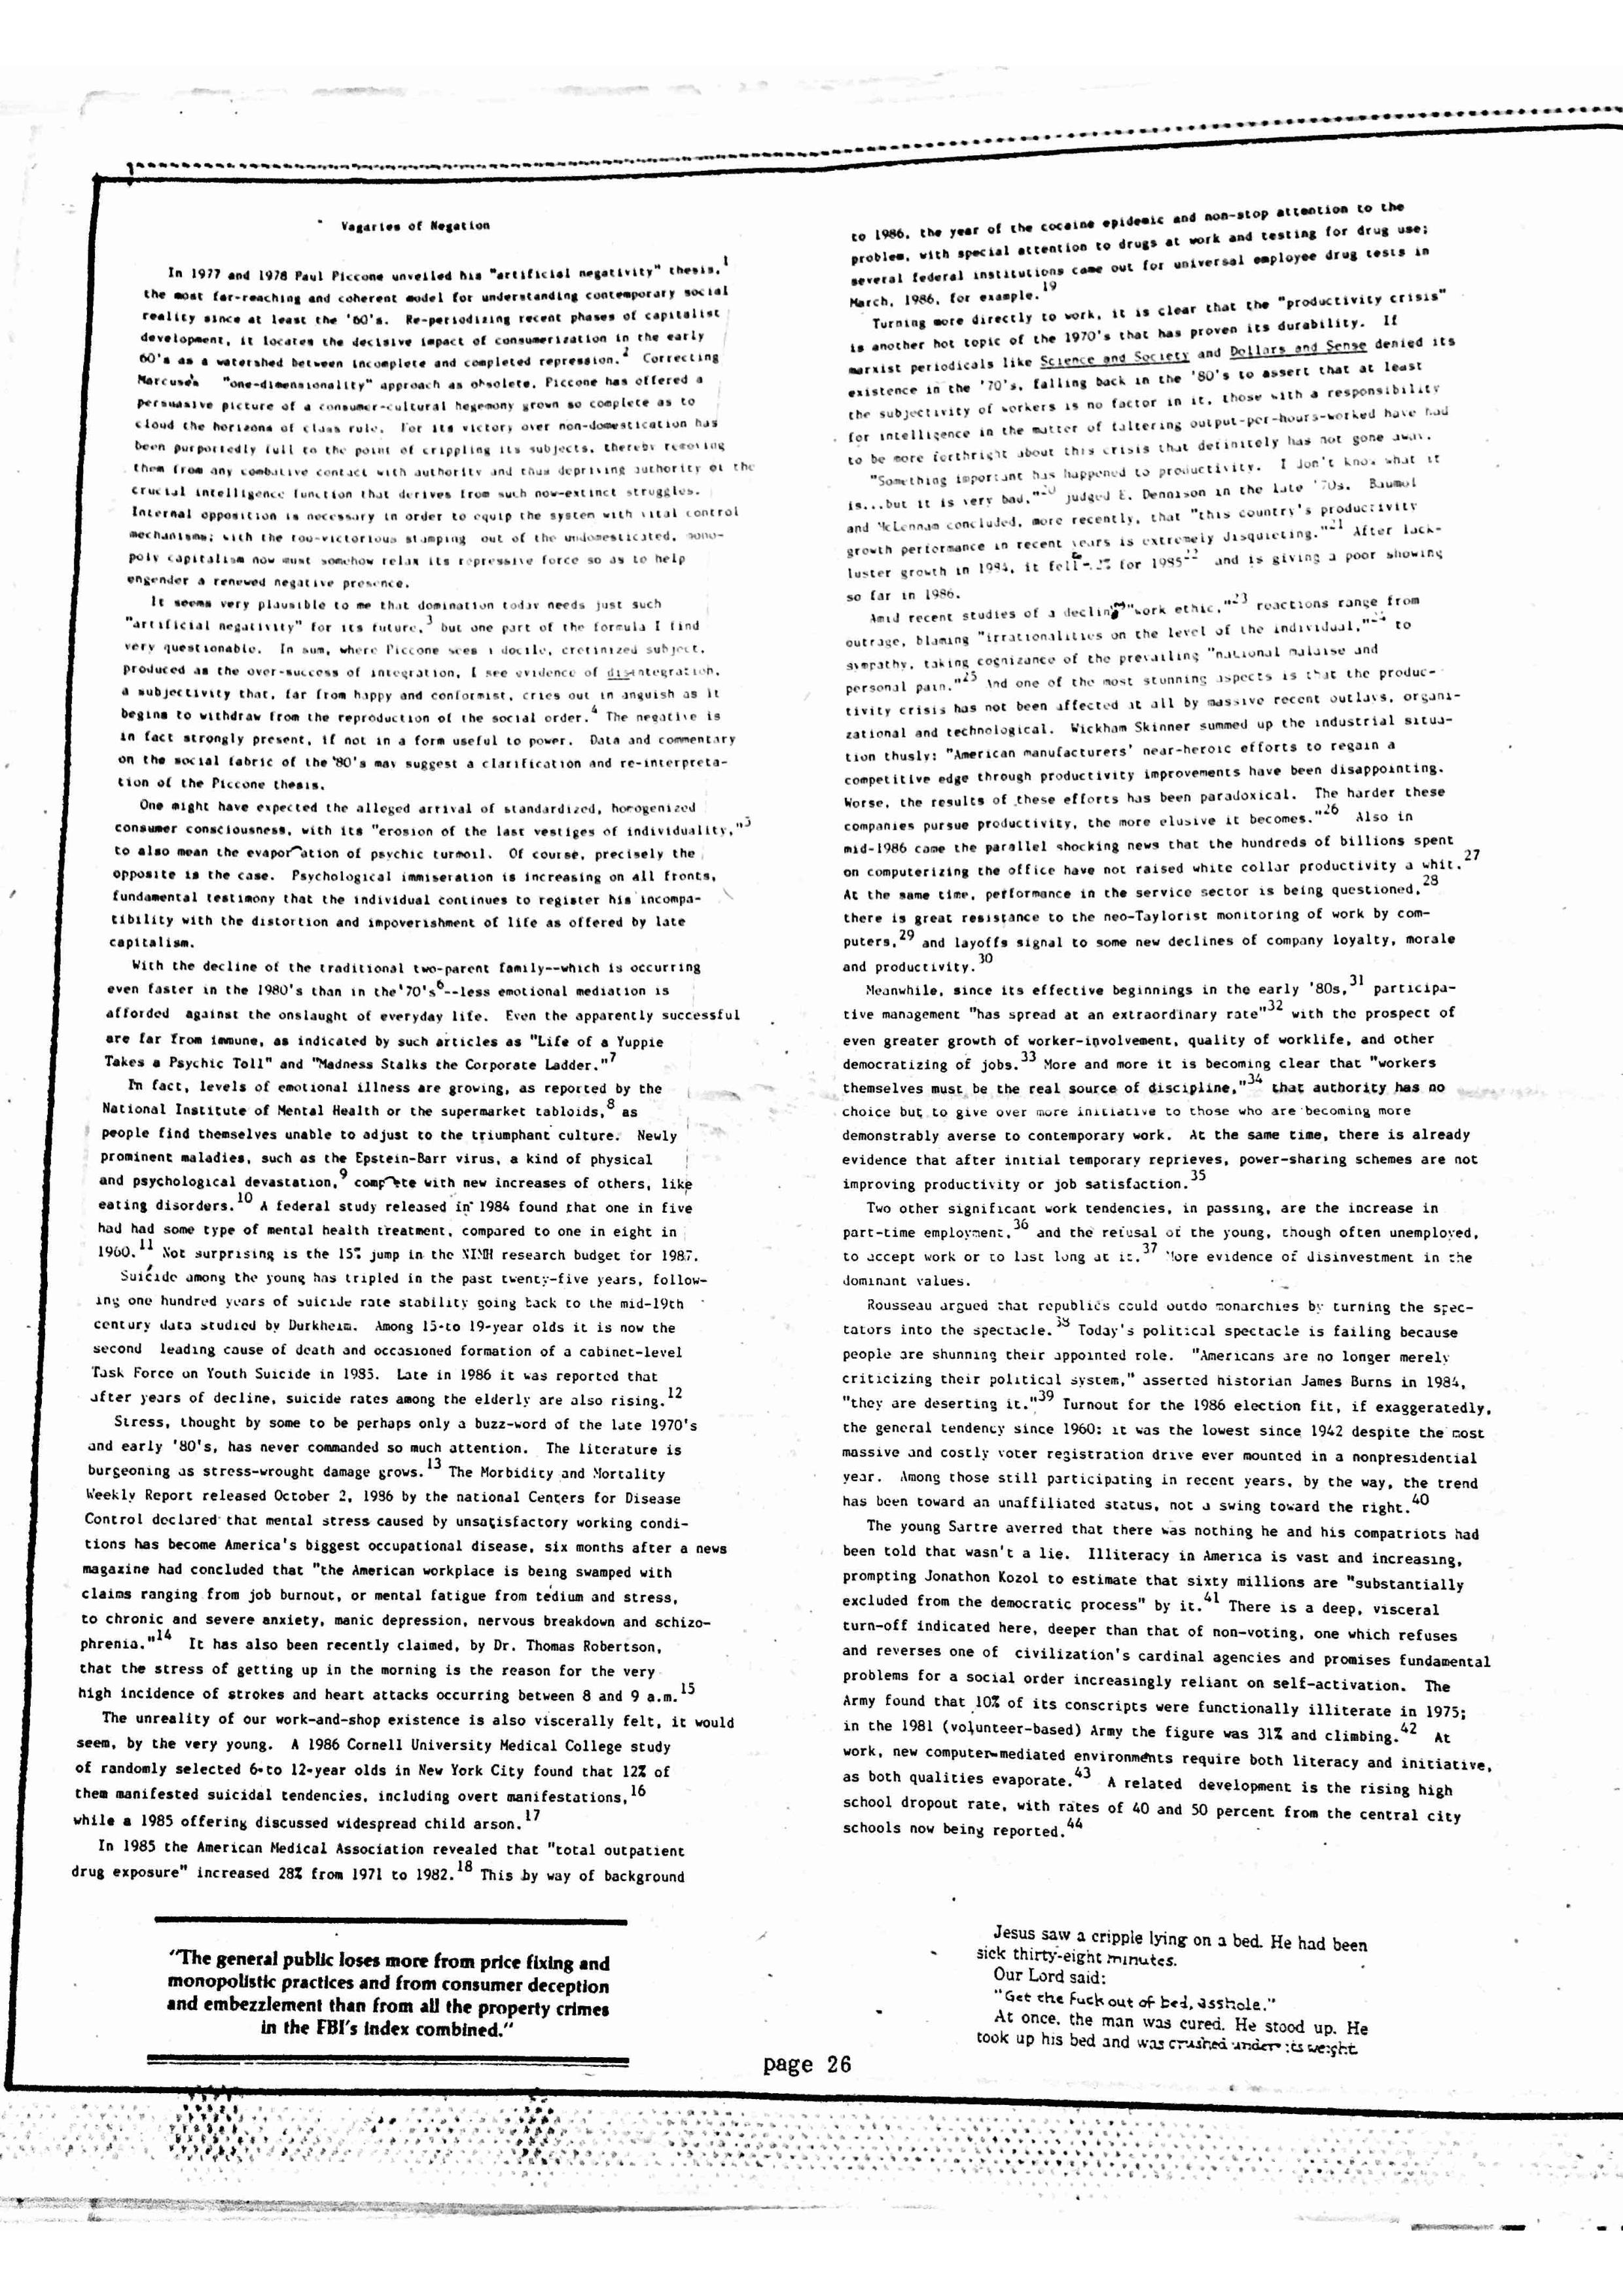 PopRealLast3-page-006.jpg